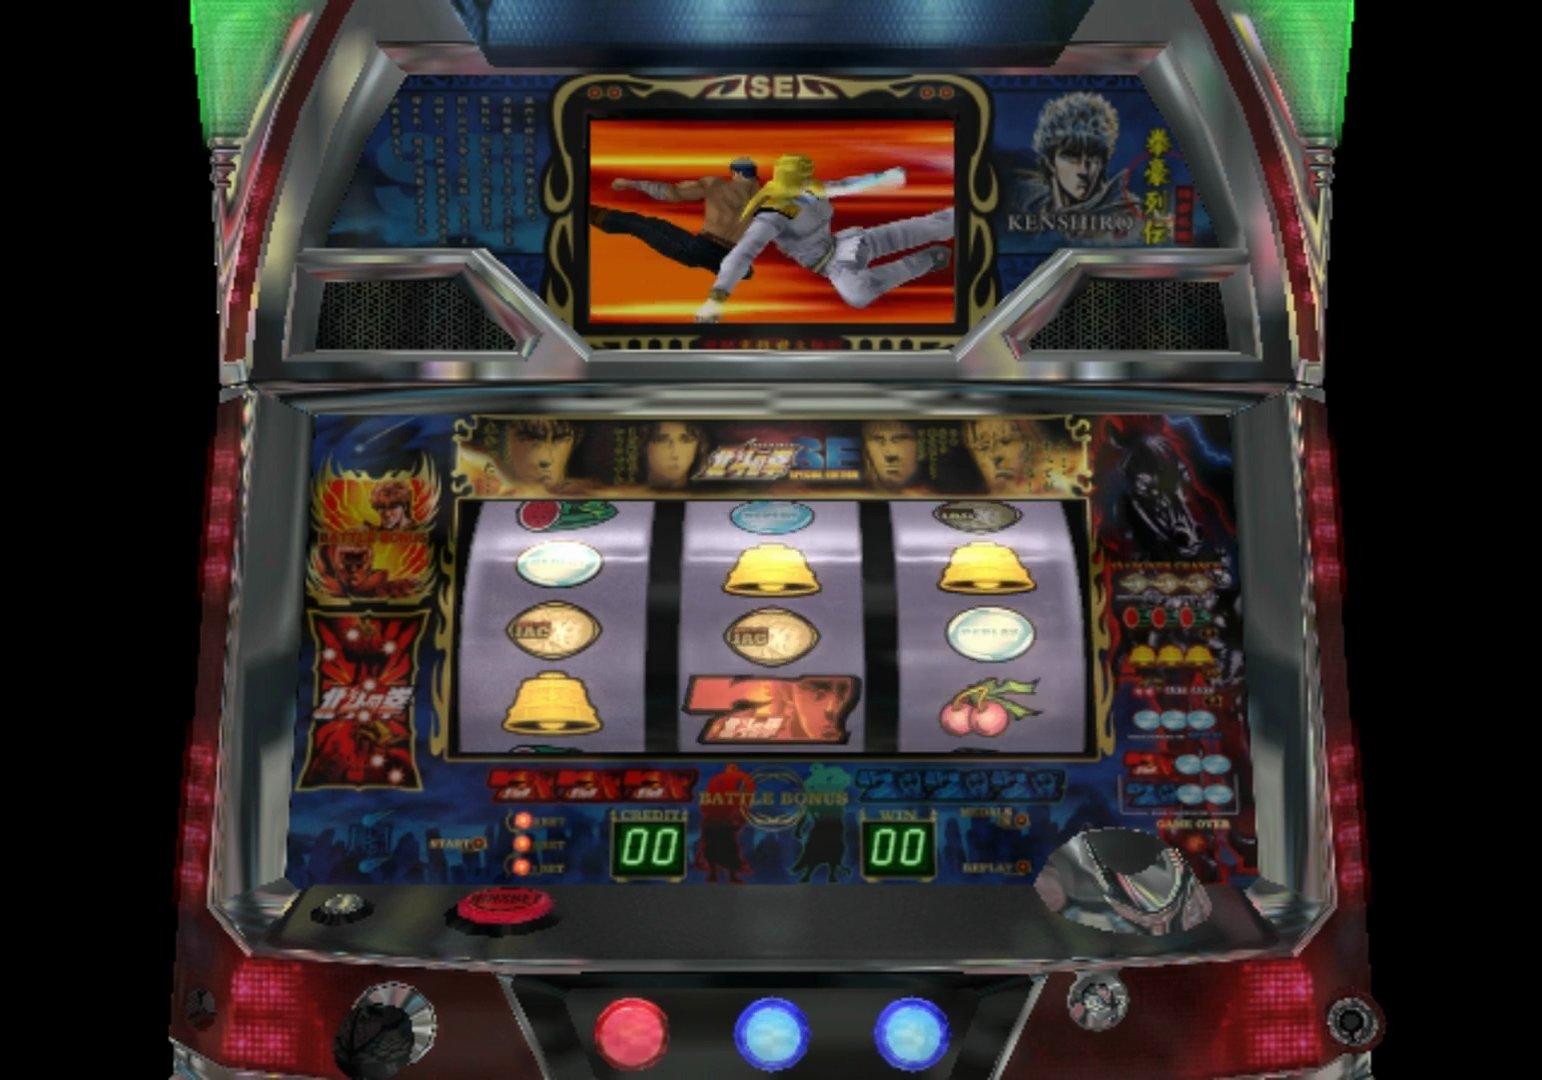 Jissen Pachi-Slot Hisshouhou Hokuto no Ken Special Edition Gameplay HD 1080p PS2